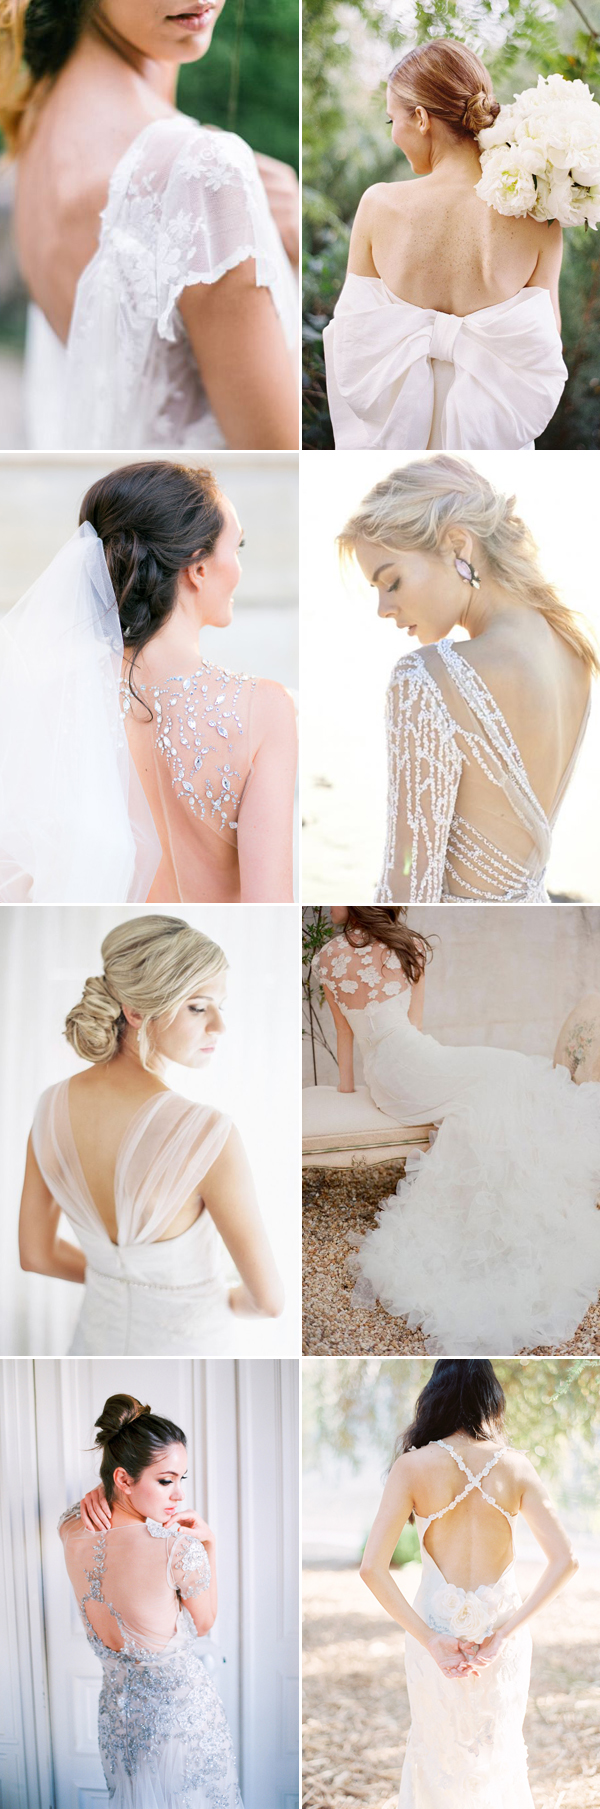 fineart01-dressdetails